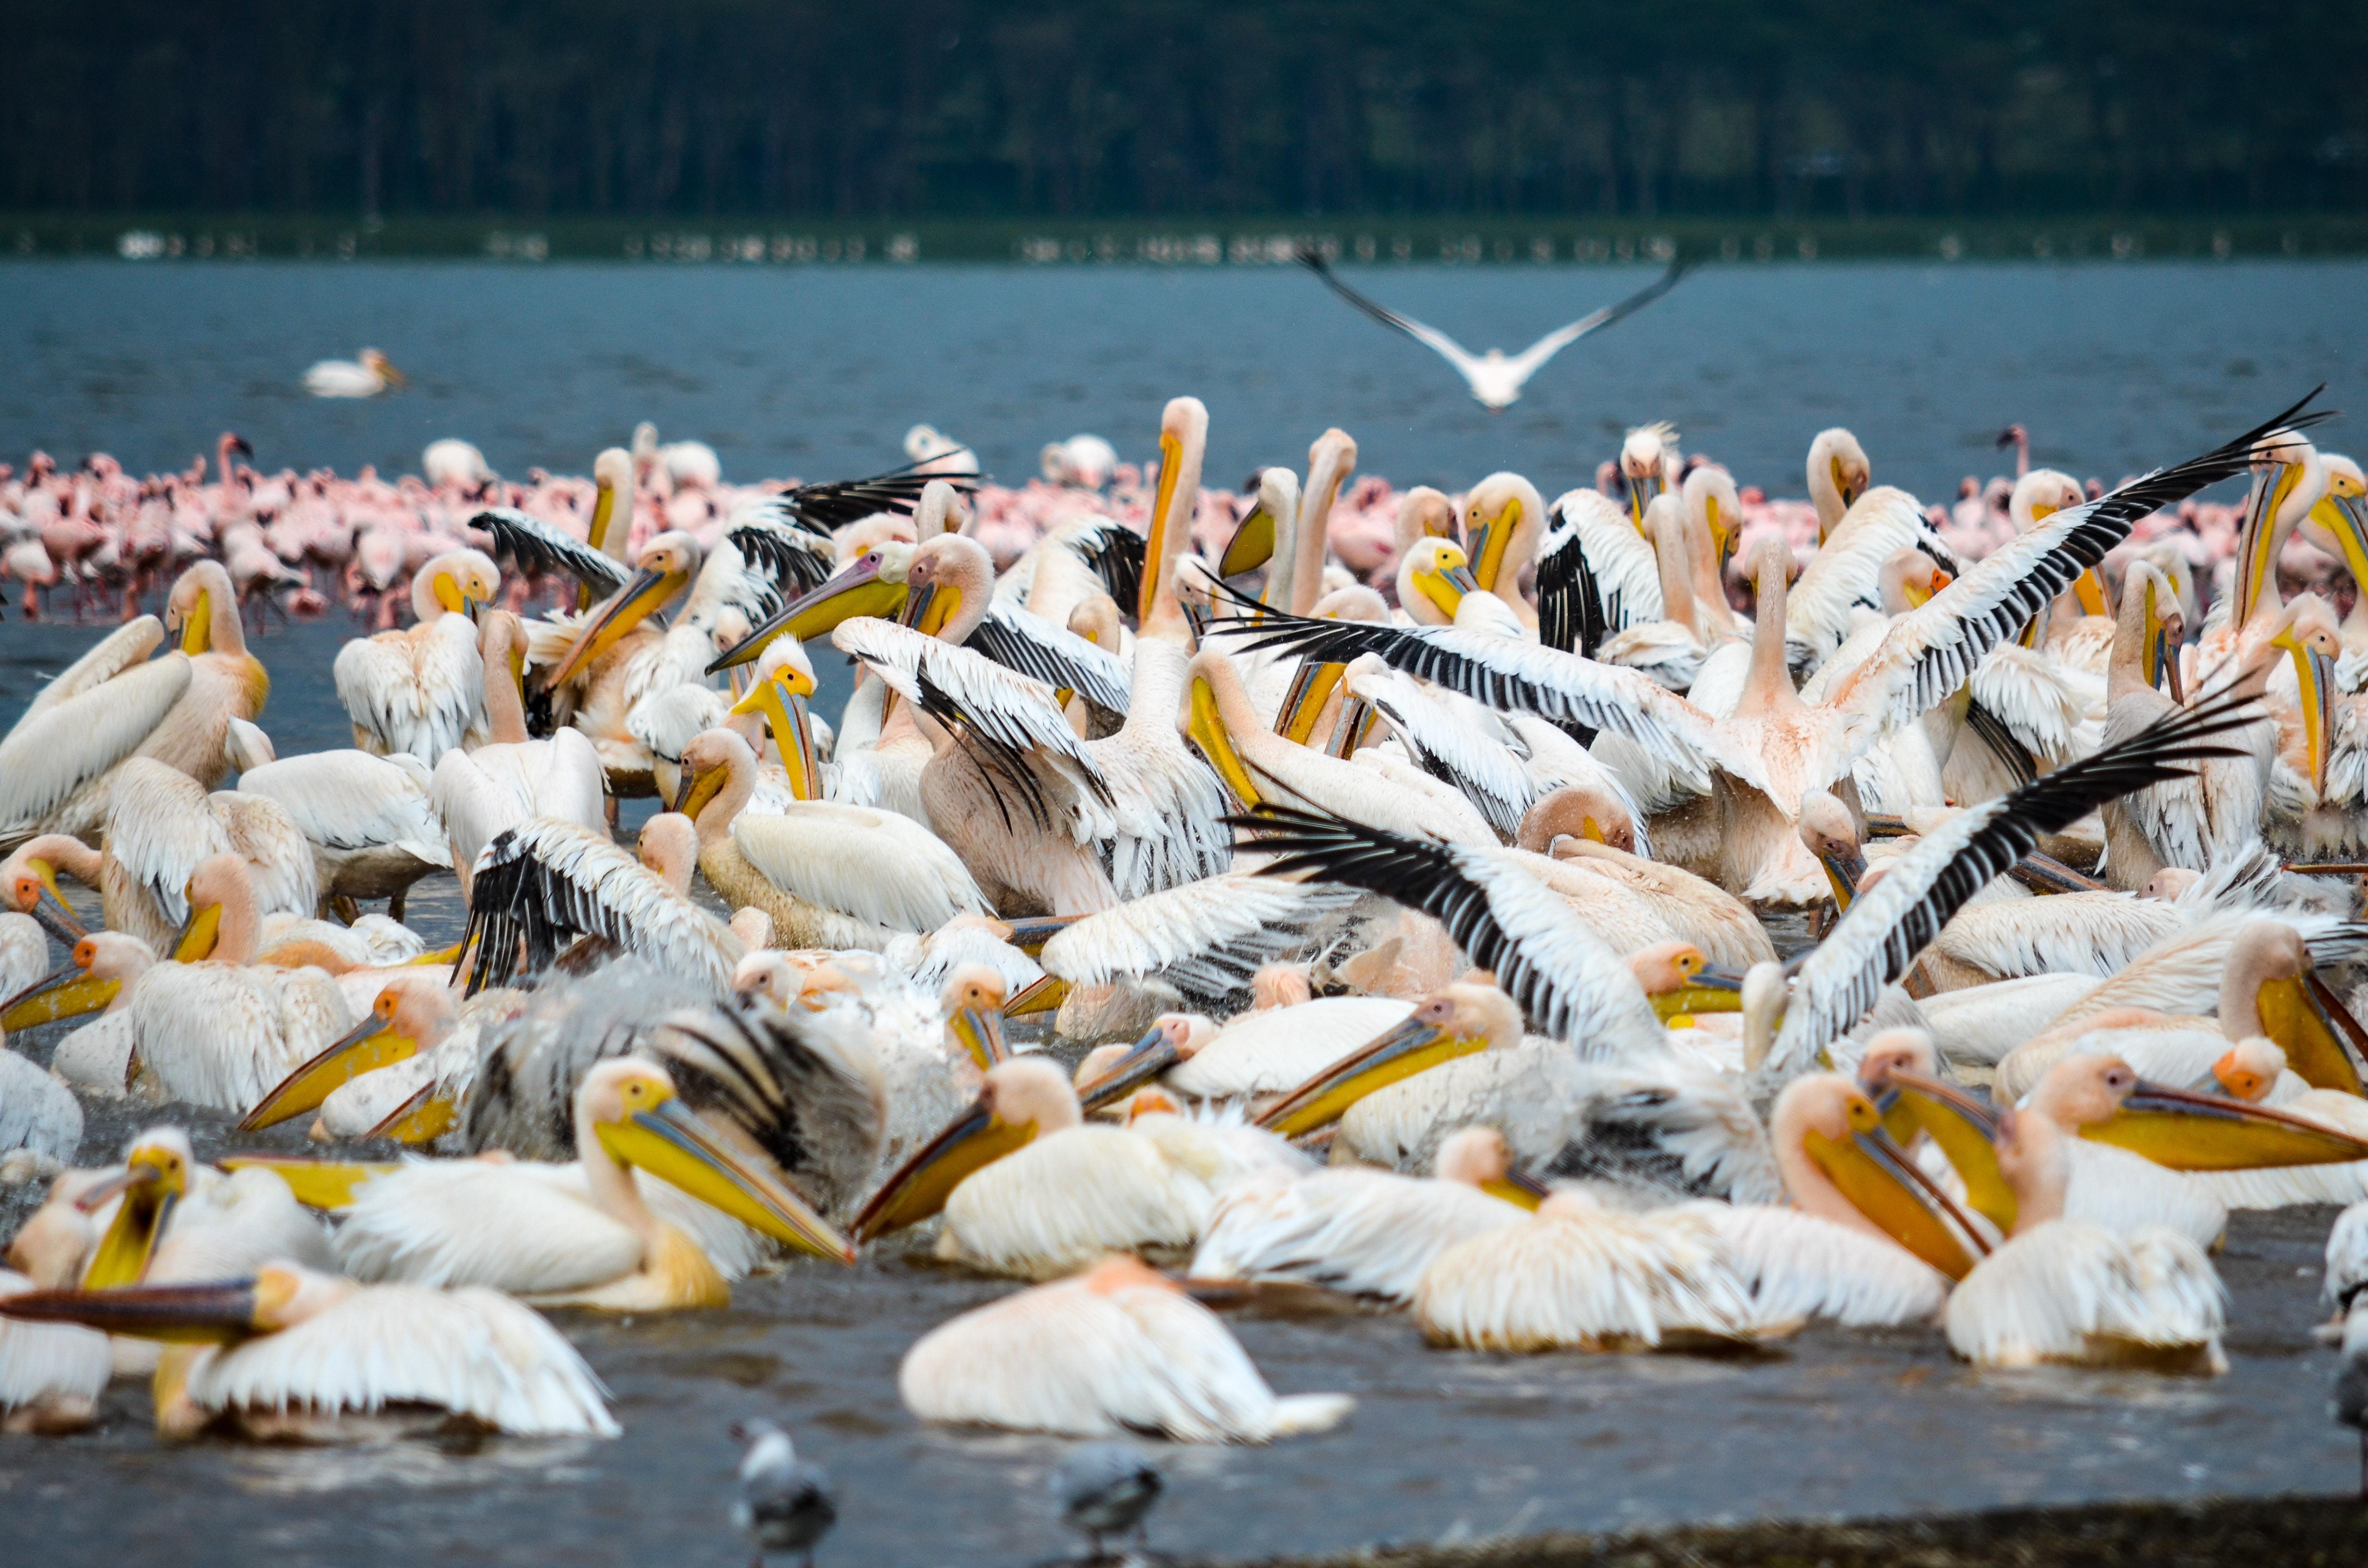 White, black, and yellow birds photo